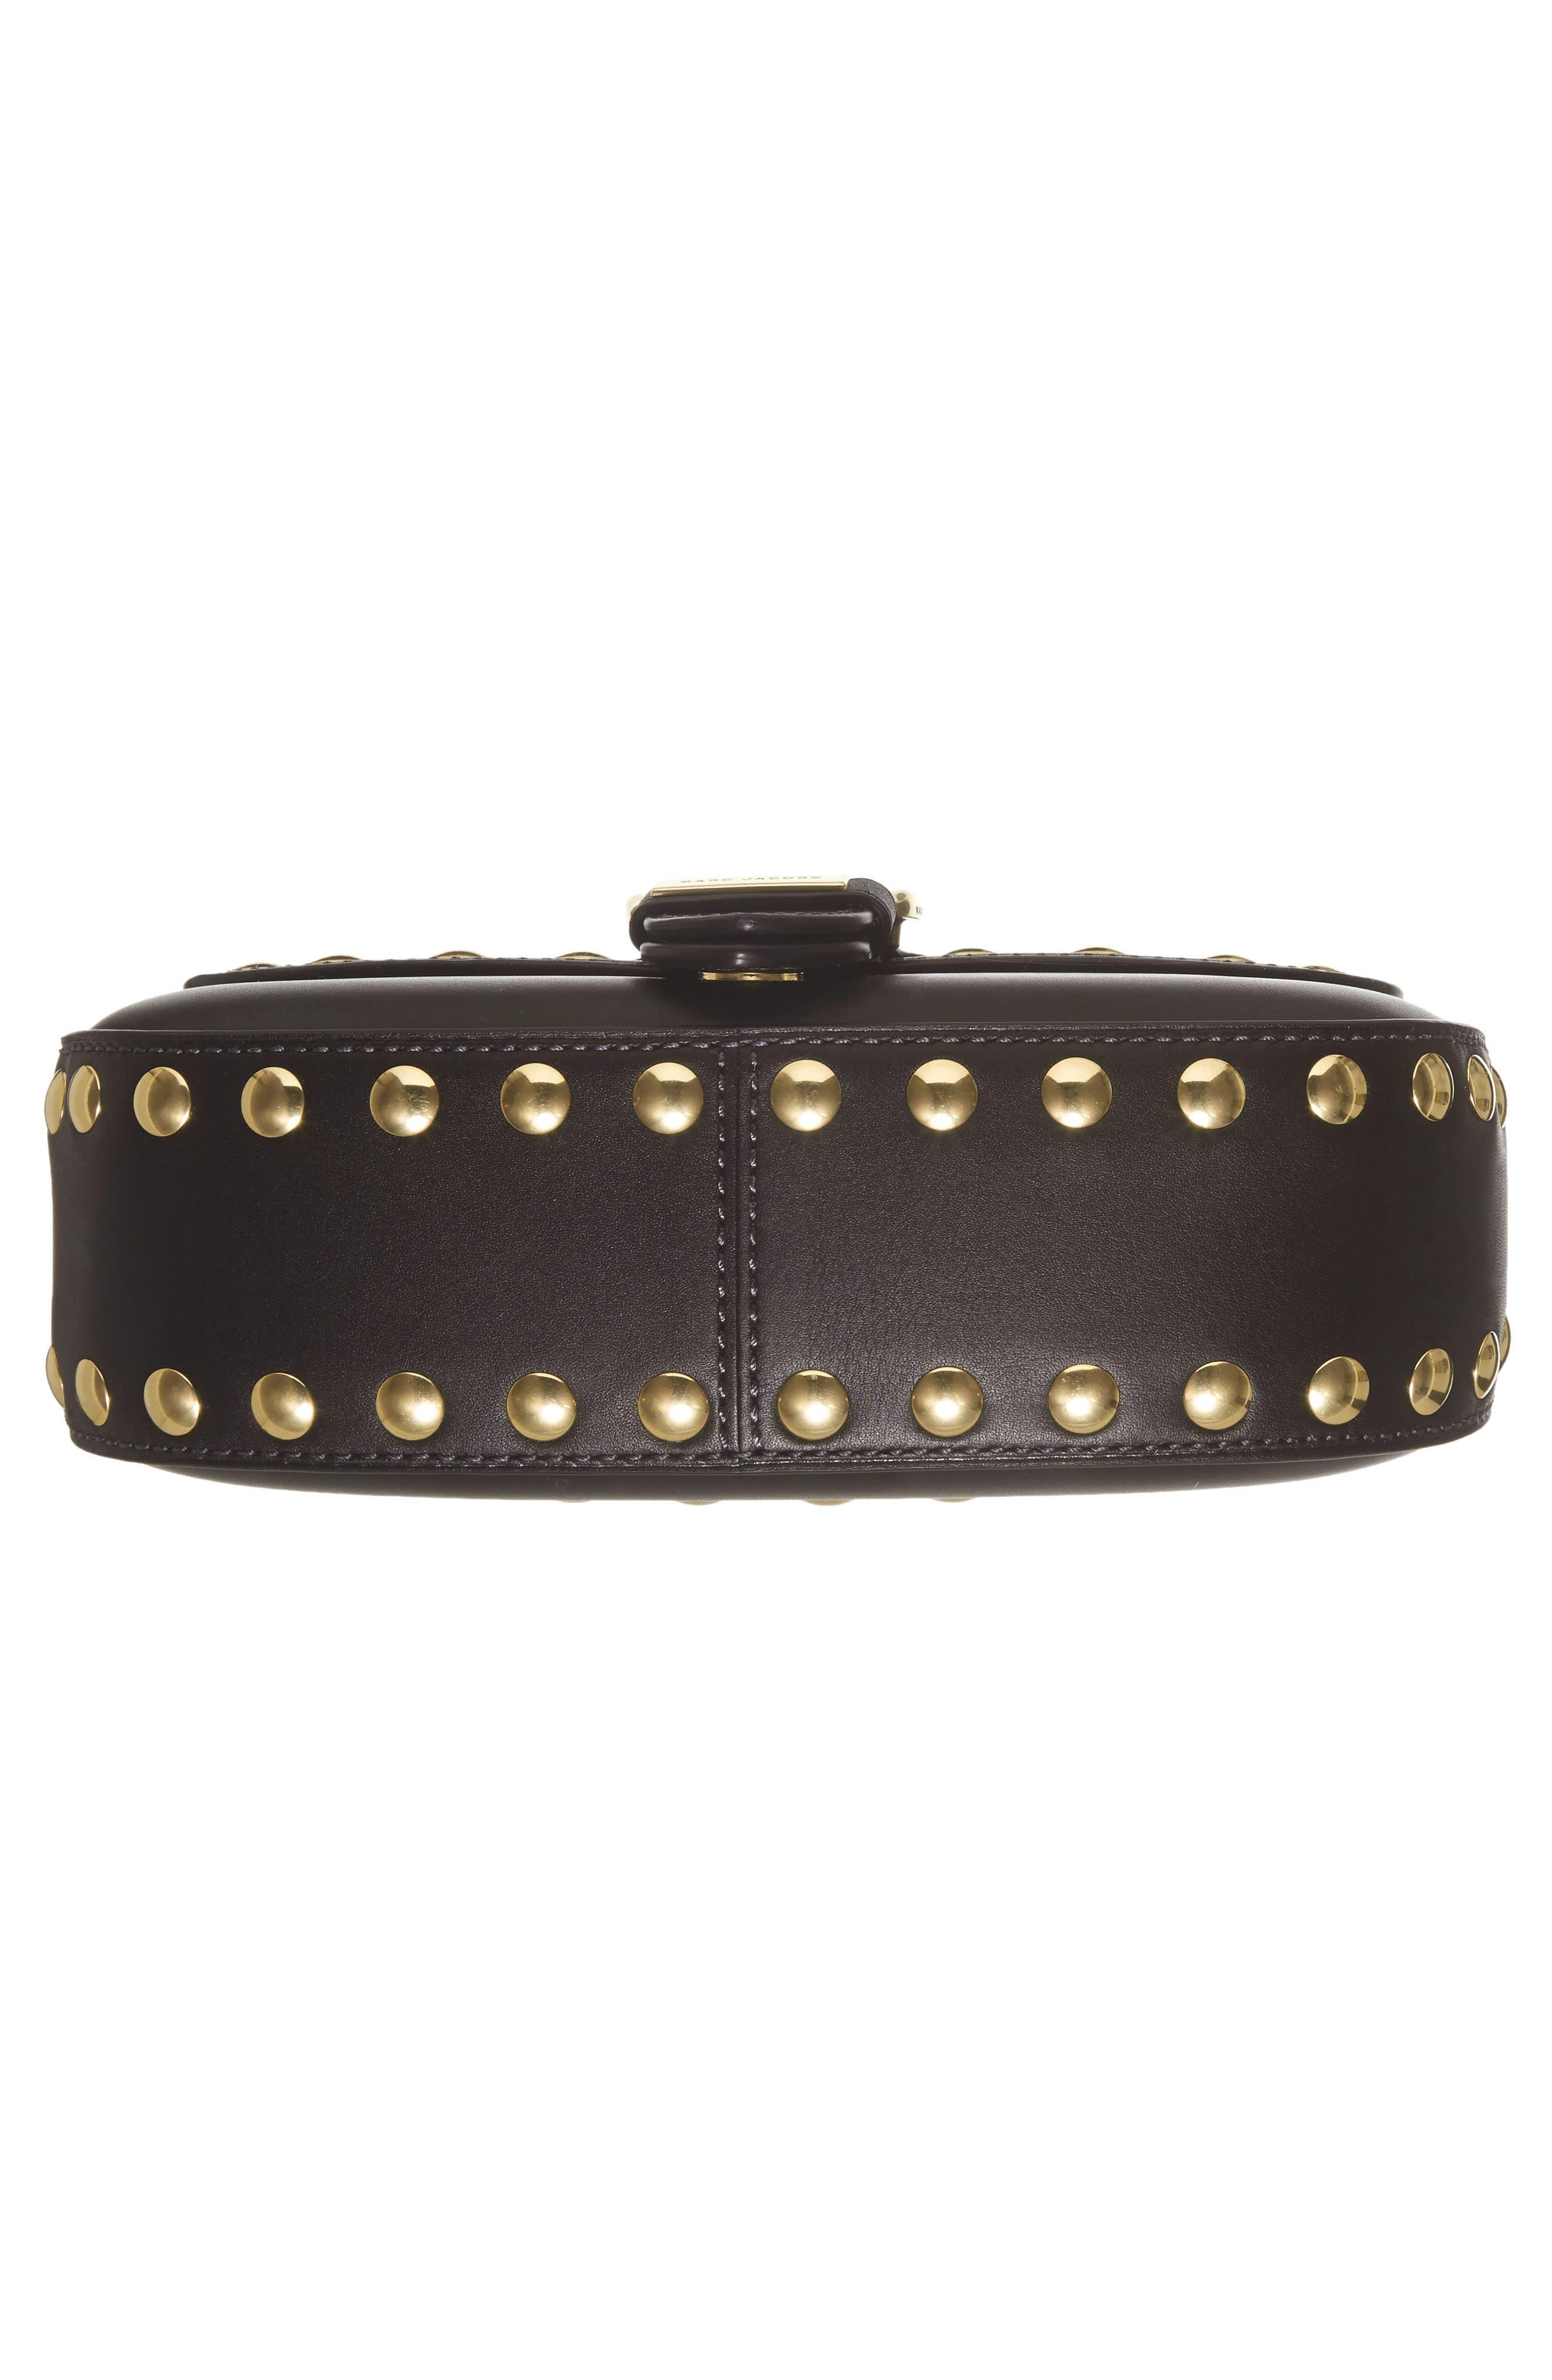 Studded Navigator Leather Crossbody Bag,                             Alternate thumbnail 6, color,                             001